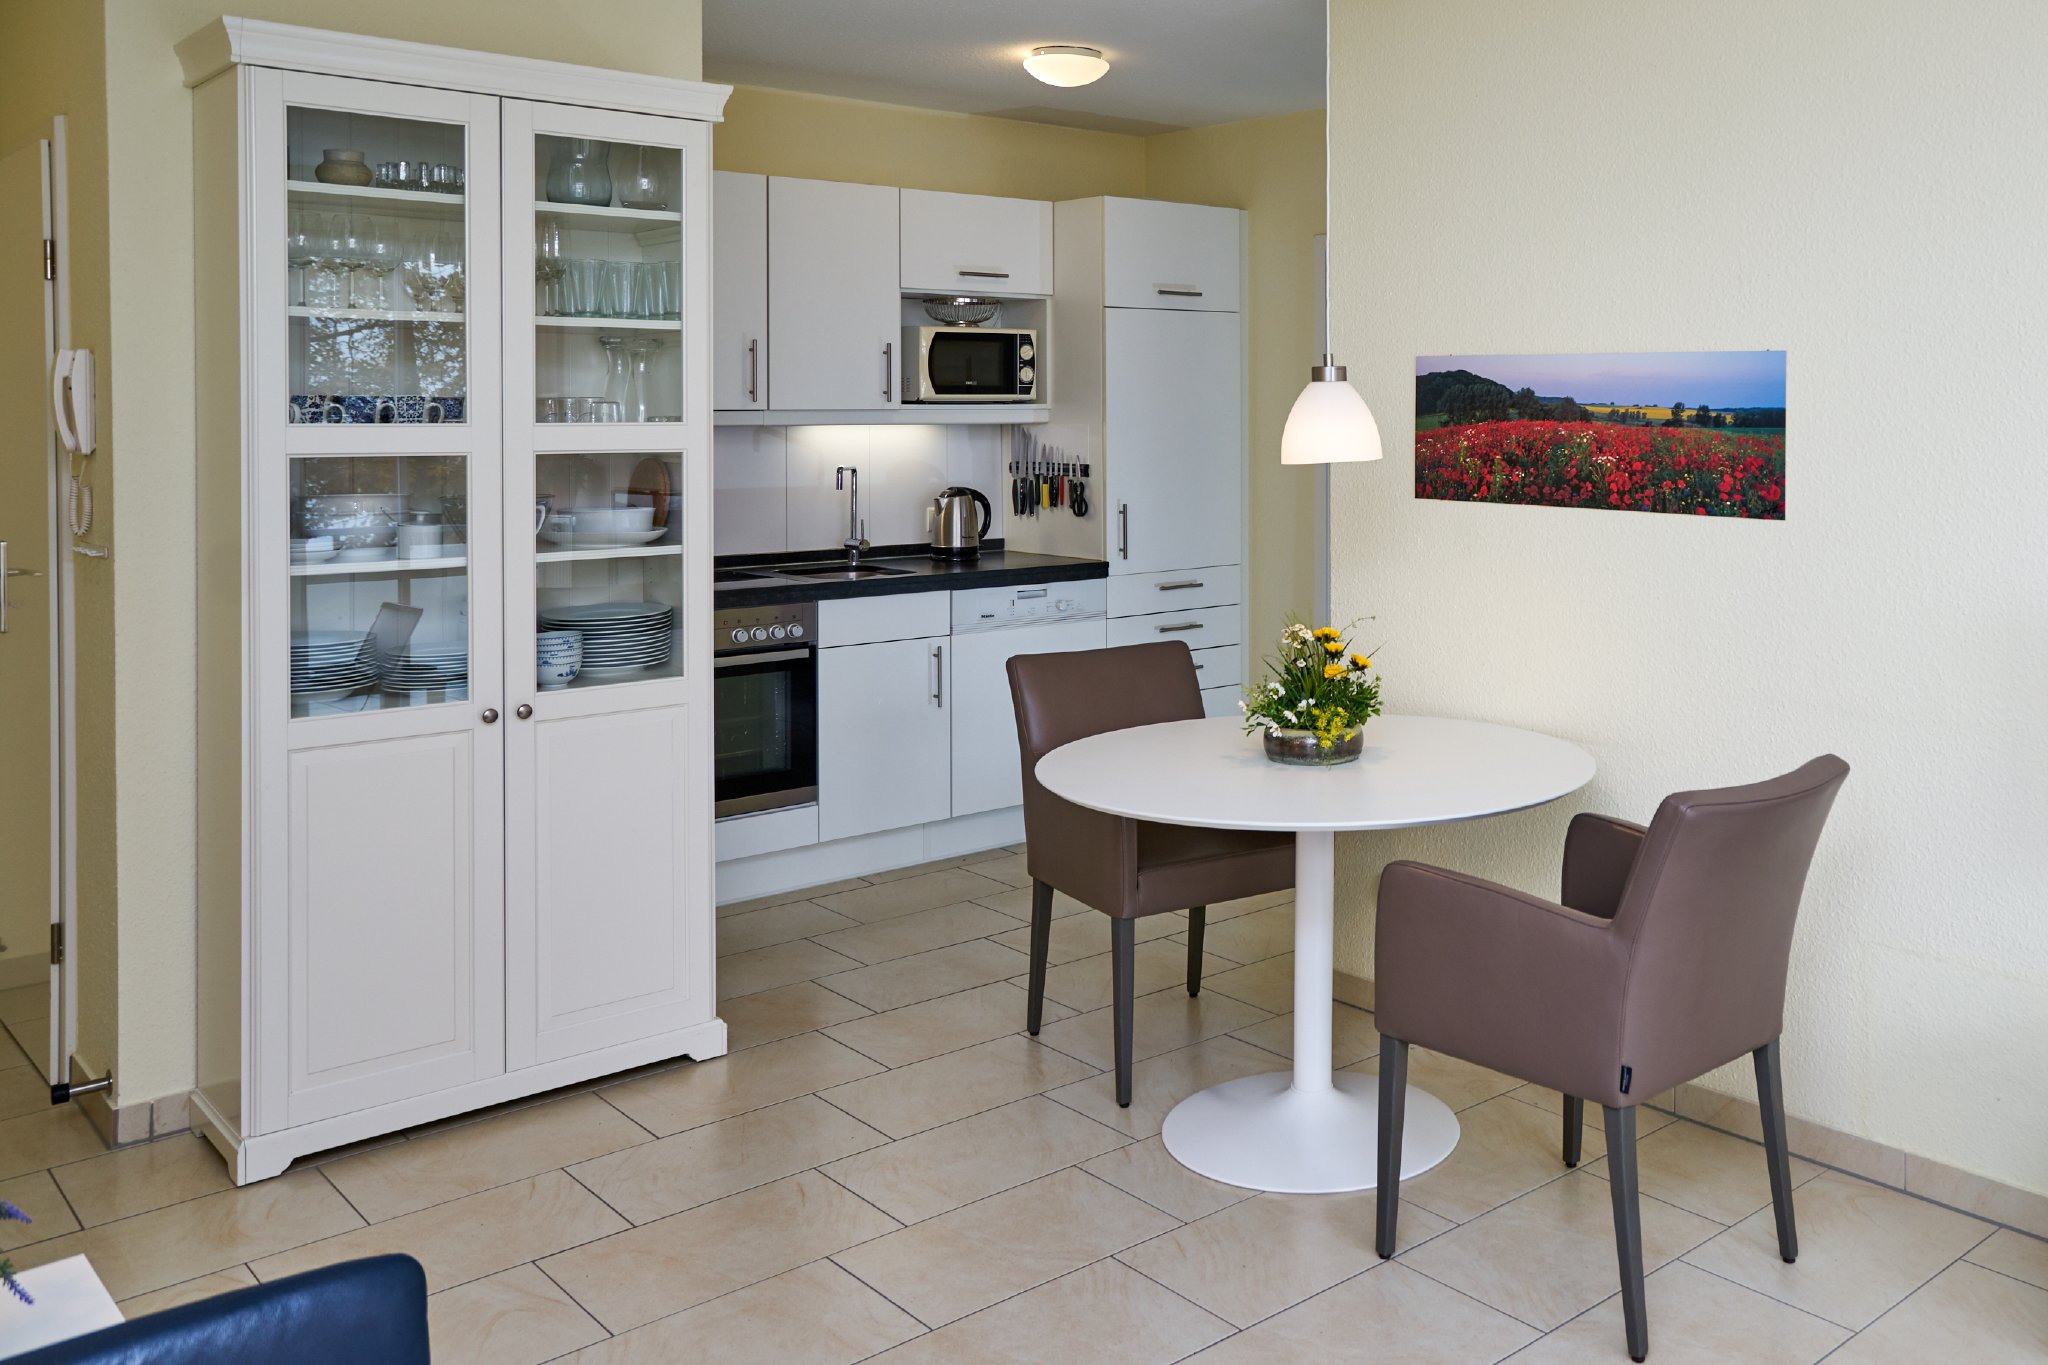 villa vilmblick wohnung 4 in putbus lauterbach mecklenburg vorpommern michael senger. Black Bedroom Furniture Sets. Home Design Ideas